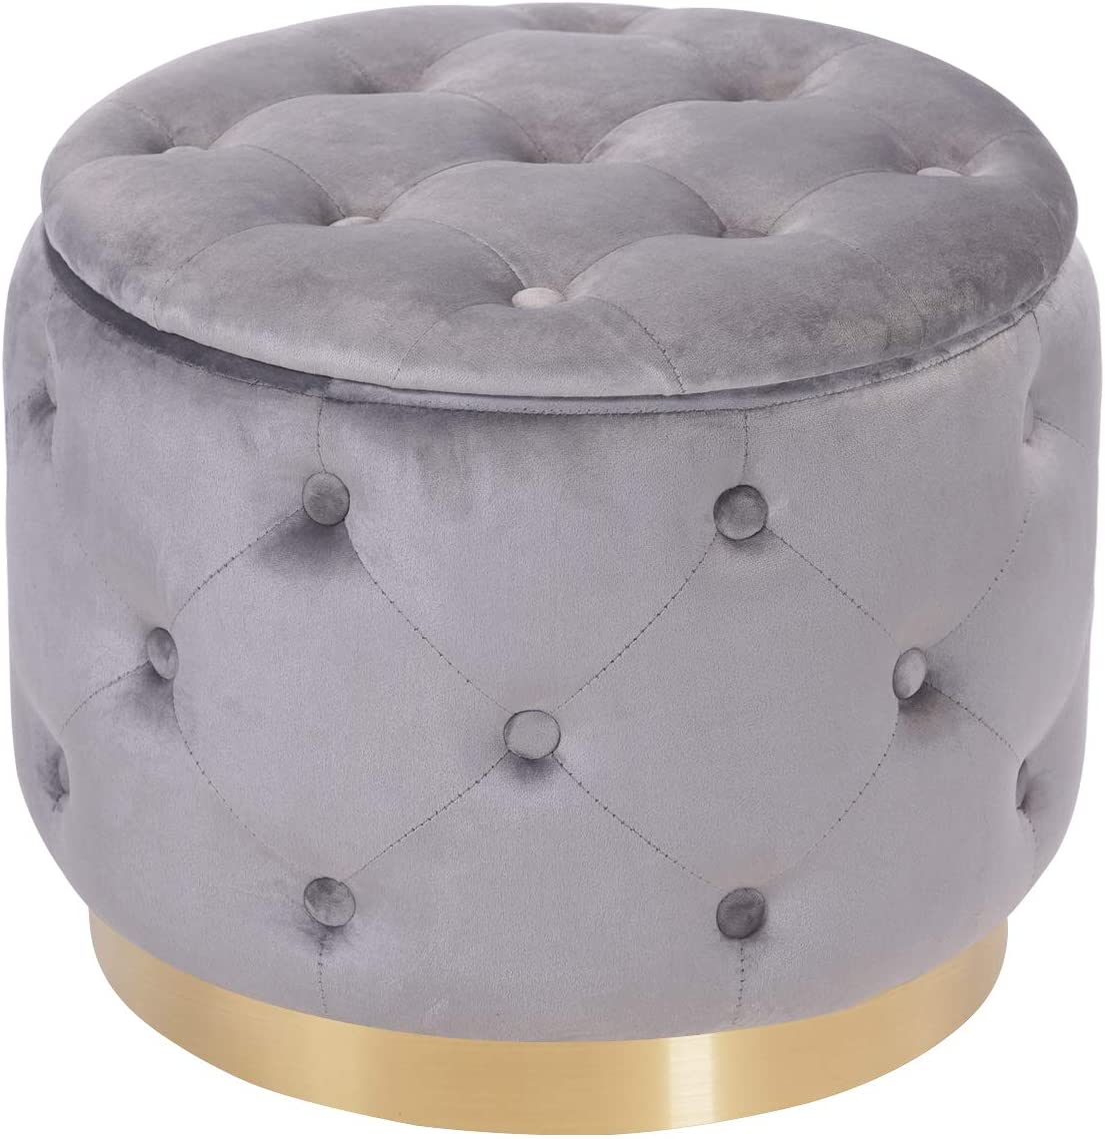 DEERUN Modern Velvet Tufted Button Upholstered Round Storage Ottoman Foot Rest Stool, Vanity Stool, Gray